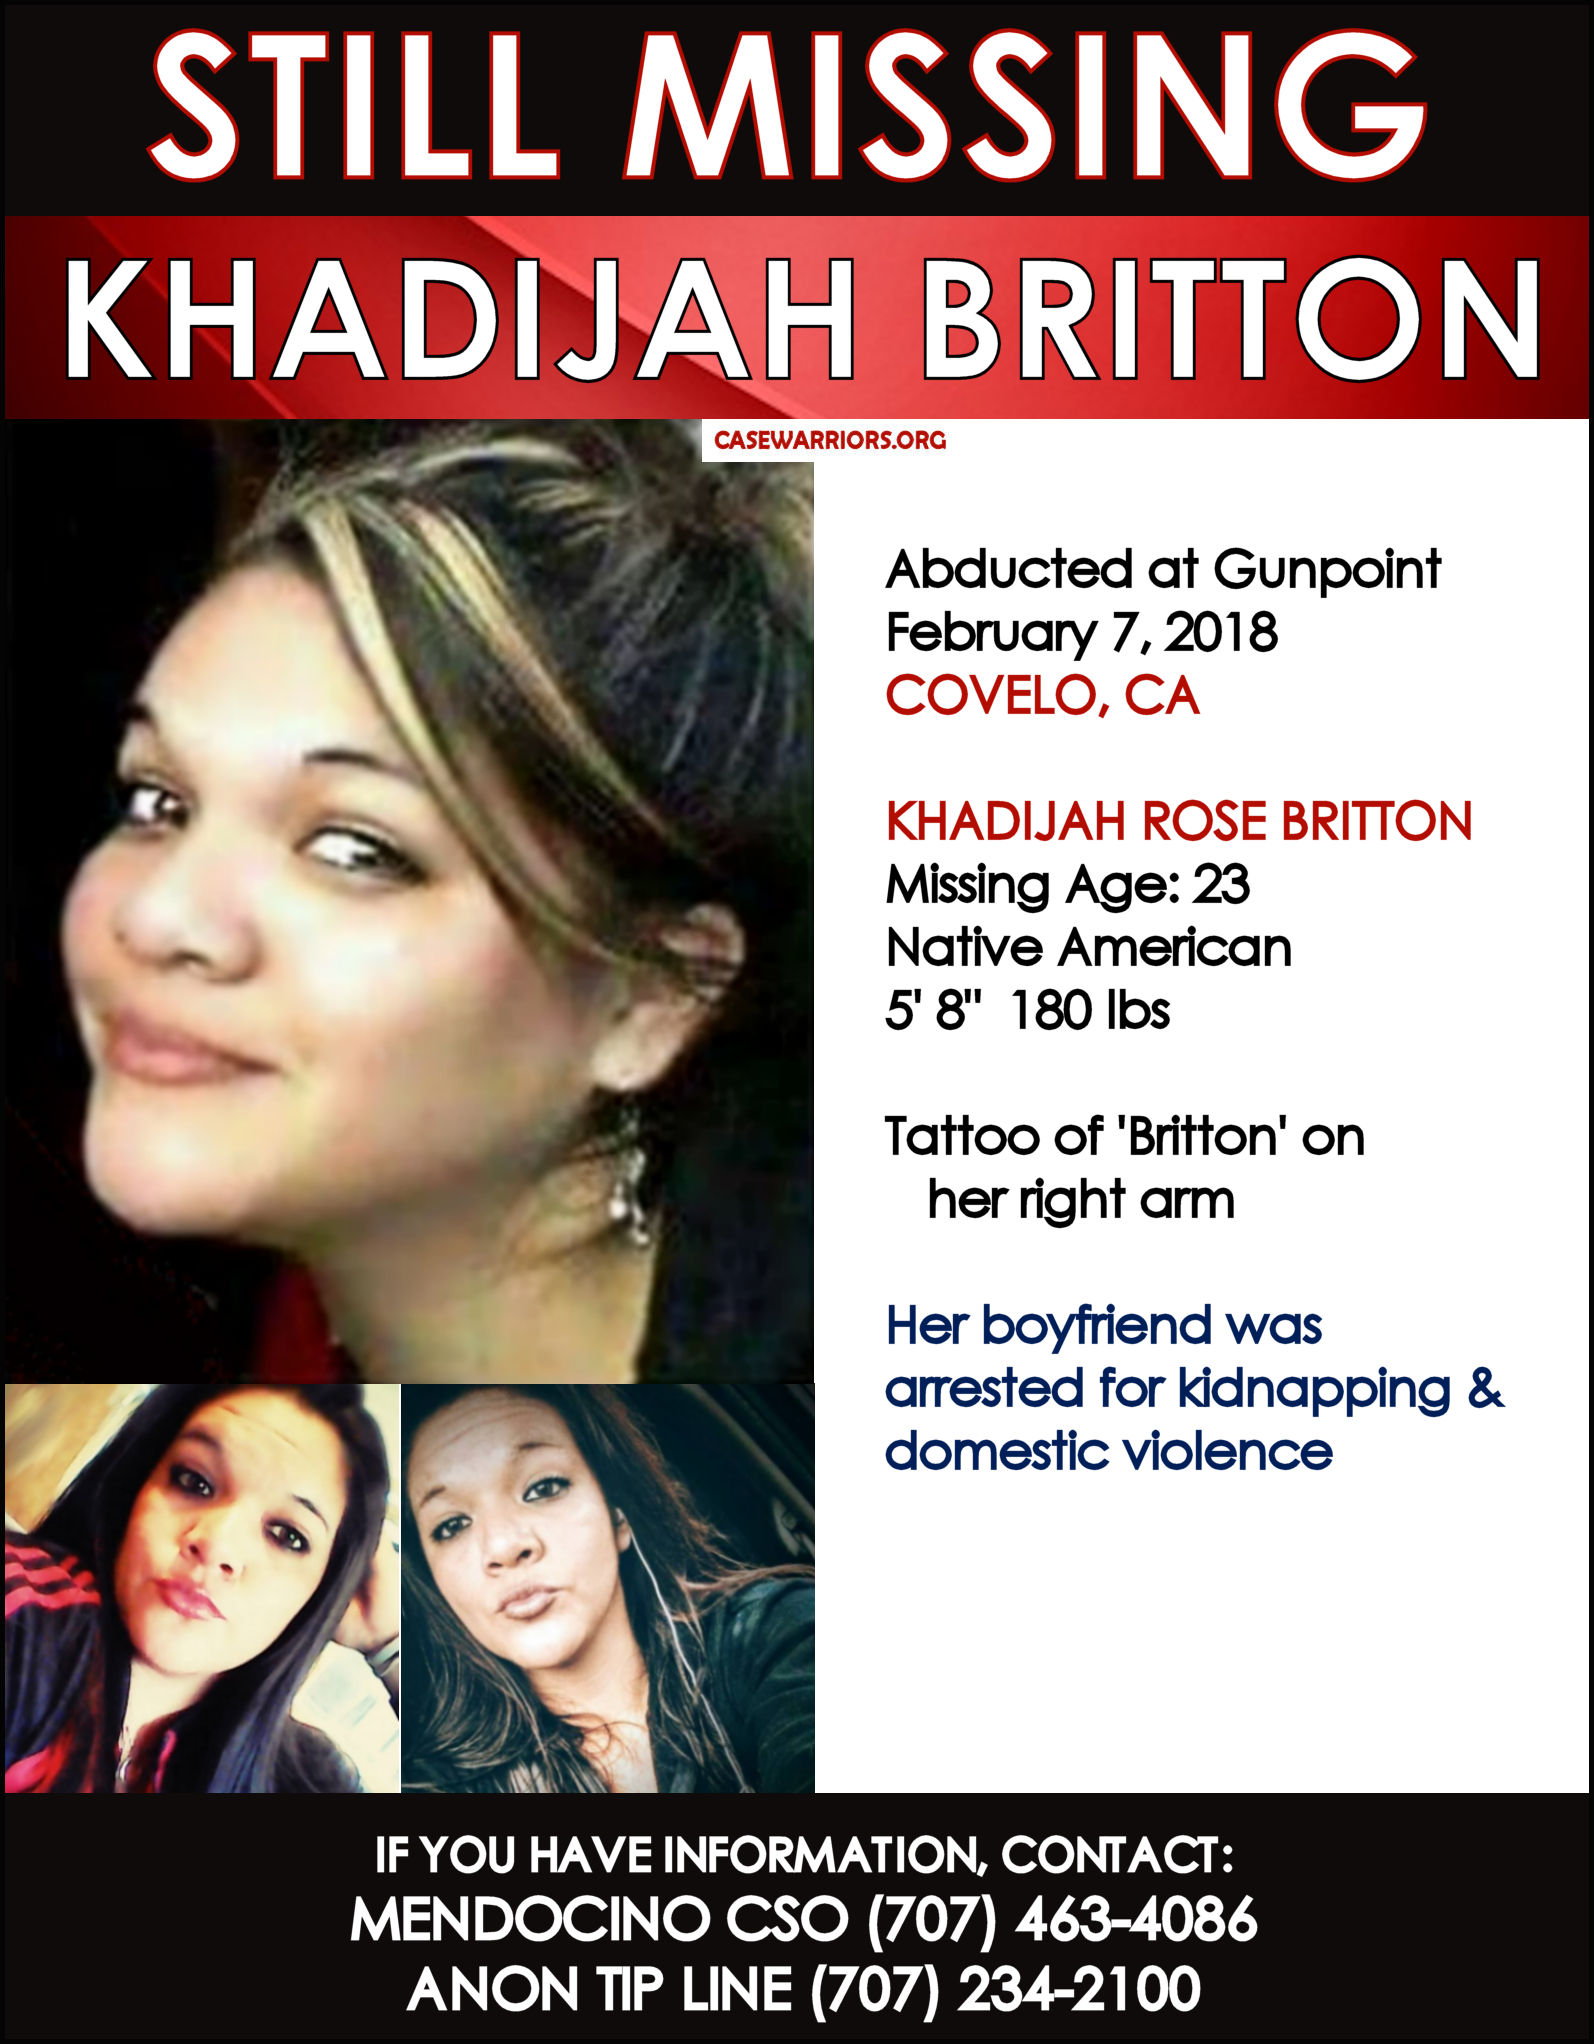 KHADIJAH BRITTON